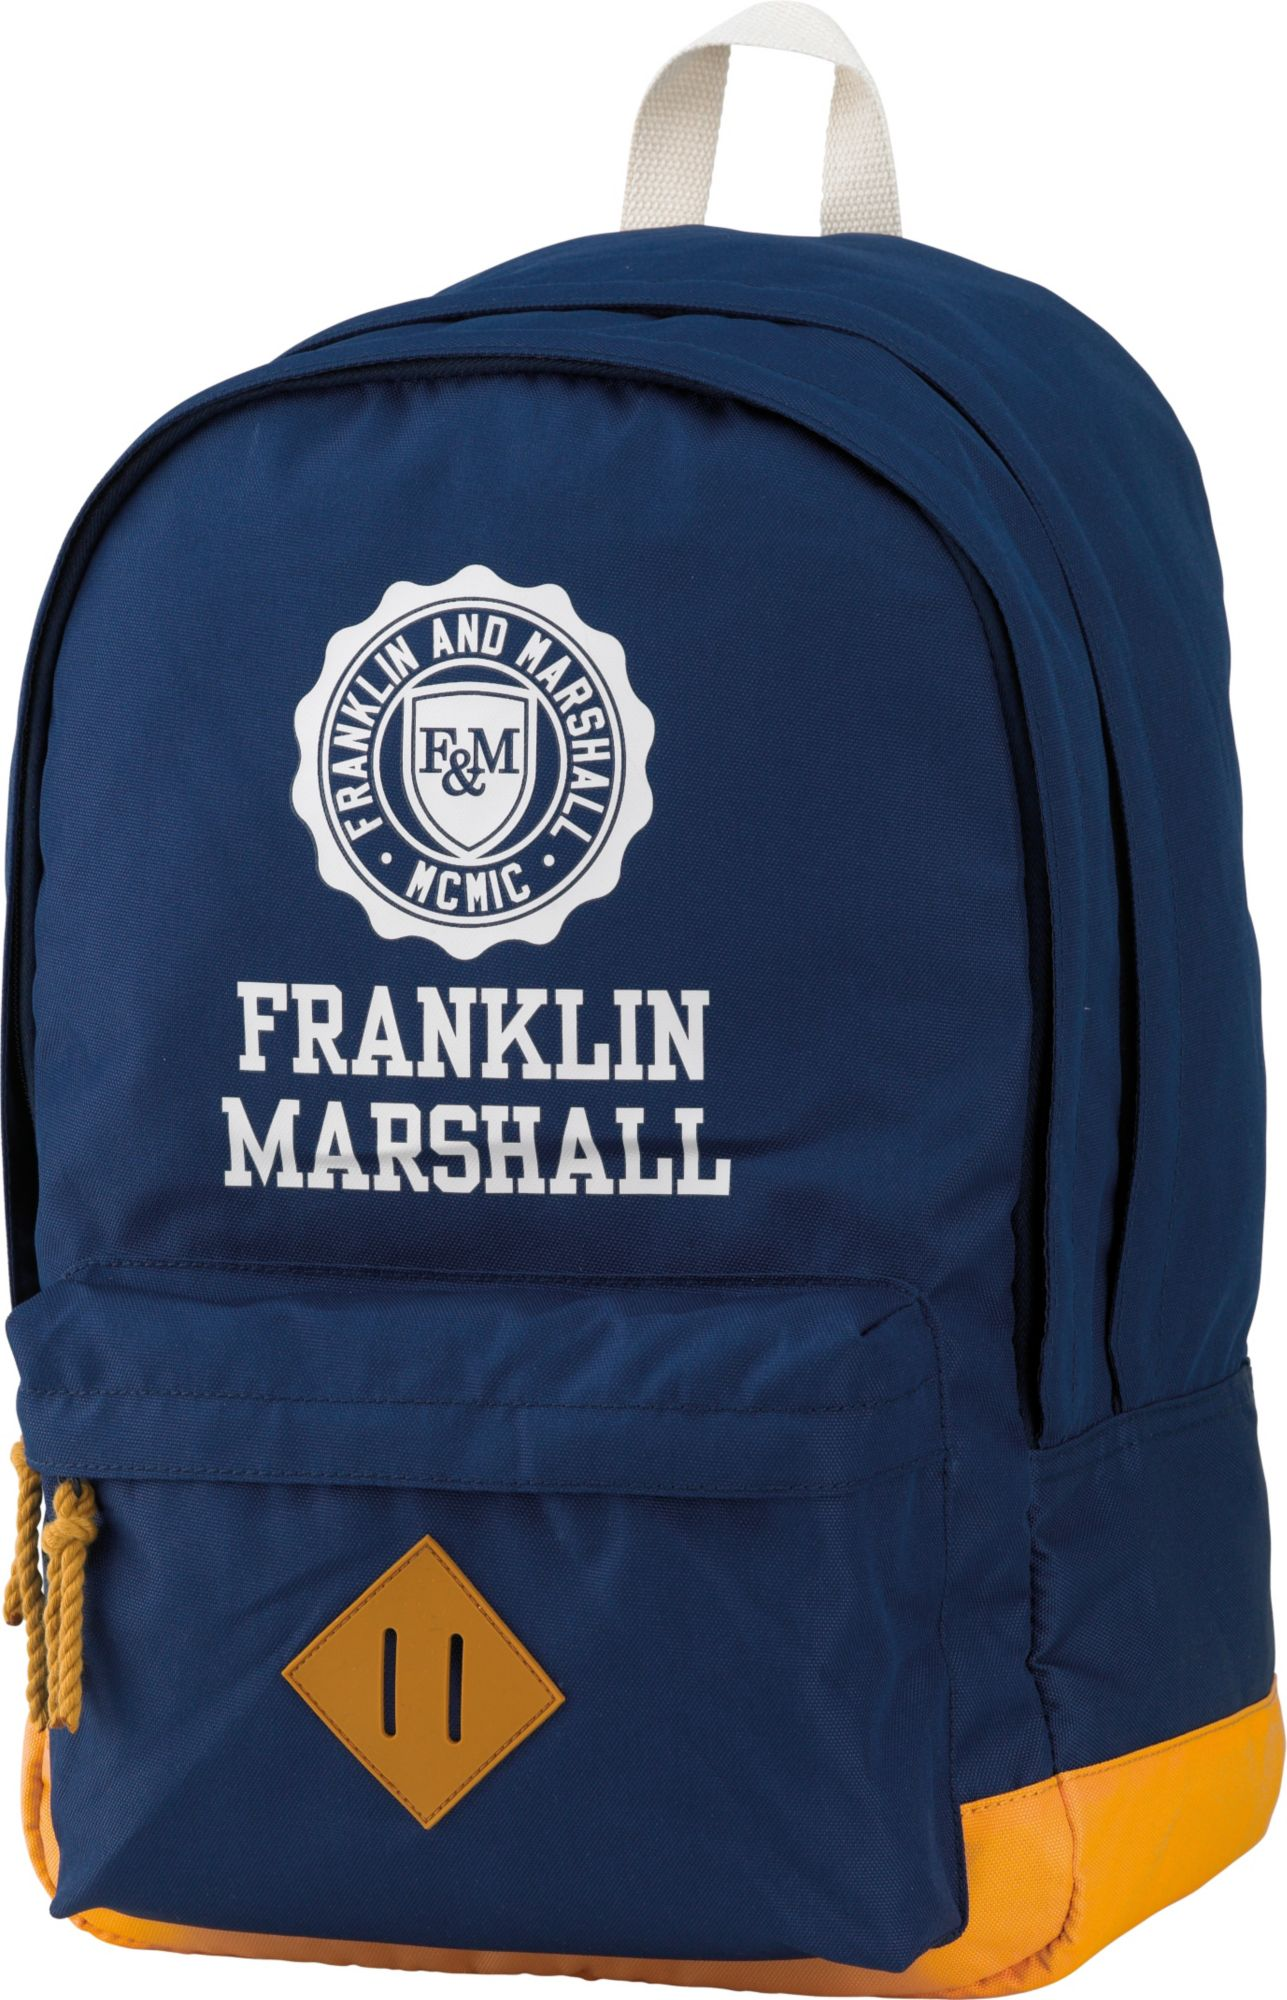 FRANKLIN MARSHALL Franklin & Marshall, Rucksack mit gummiertem Bodenschutz, »Boys Backpack dunkelblau«